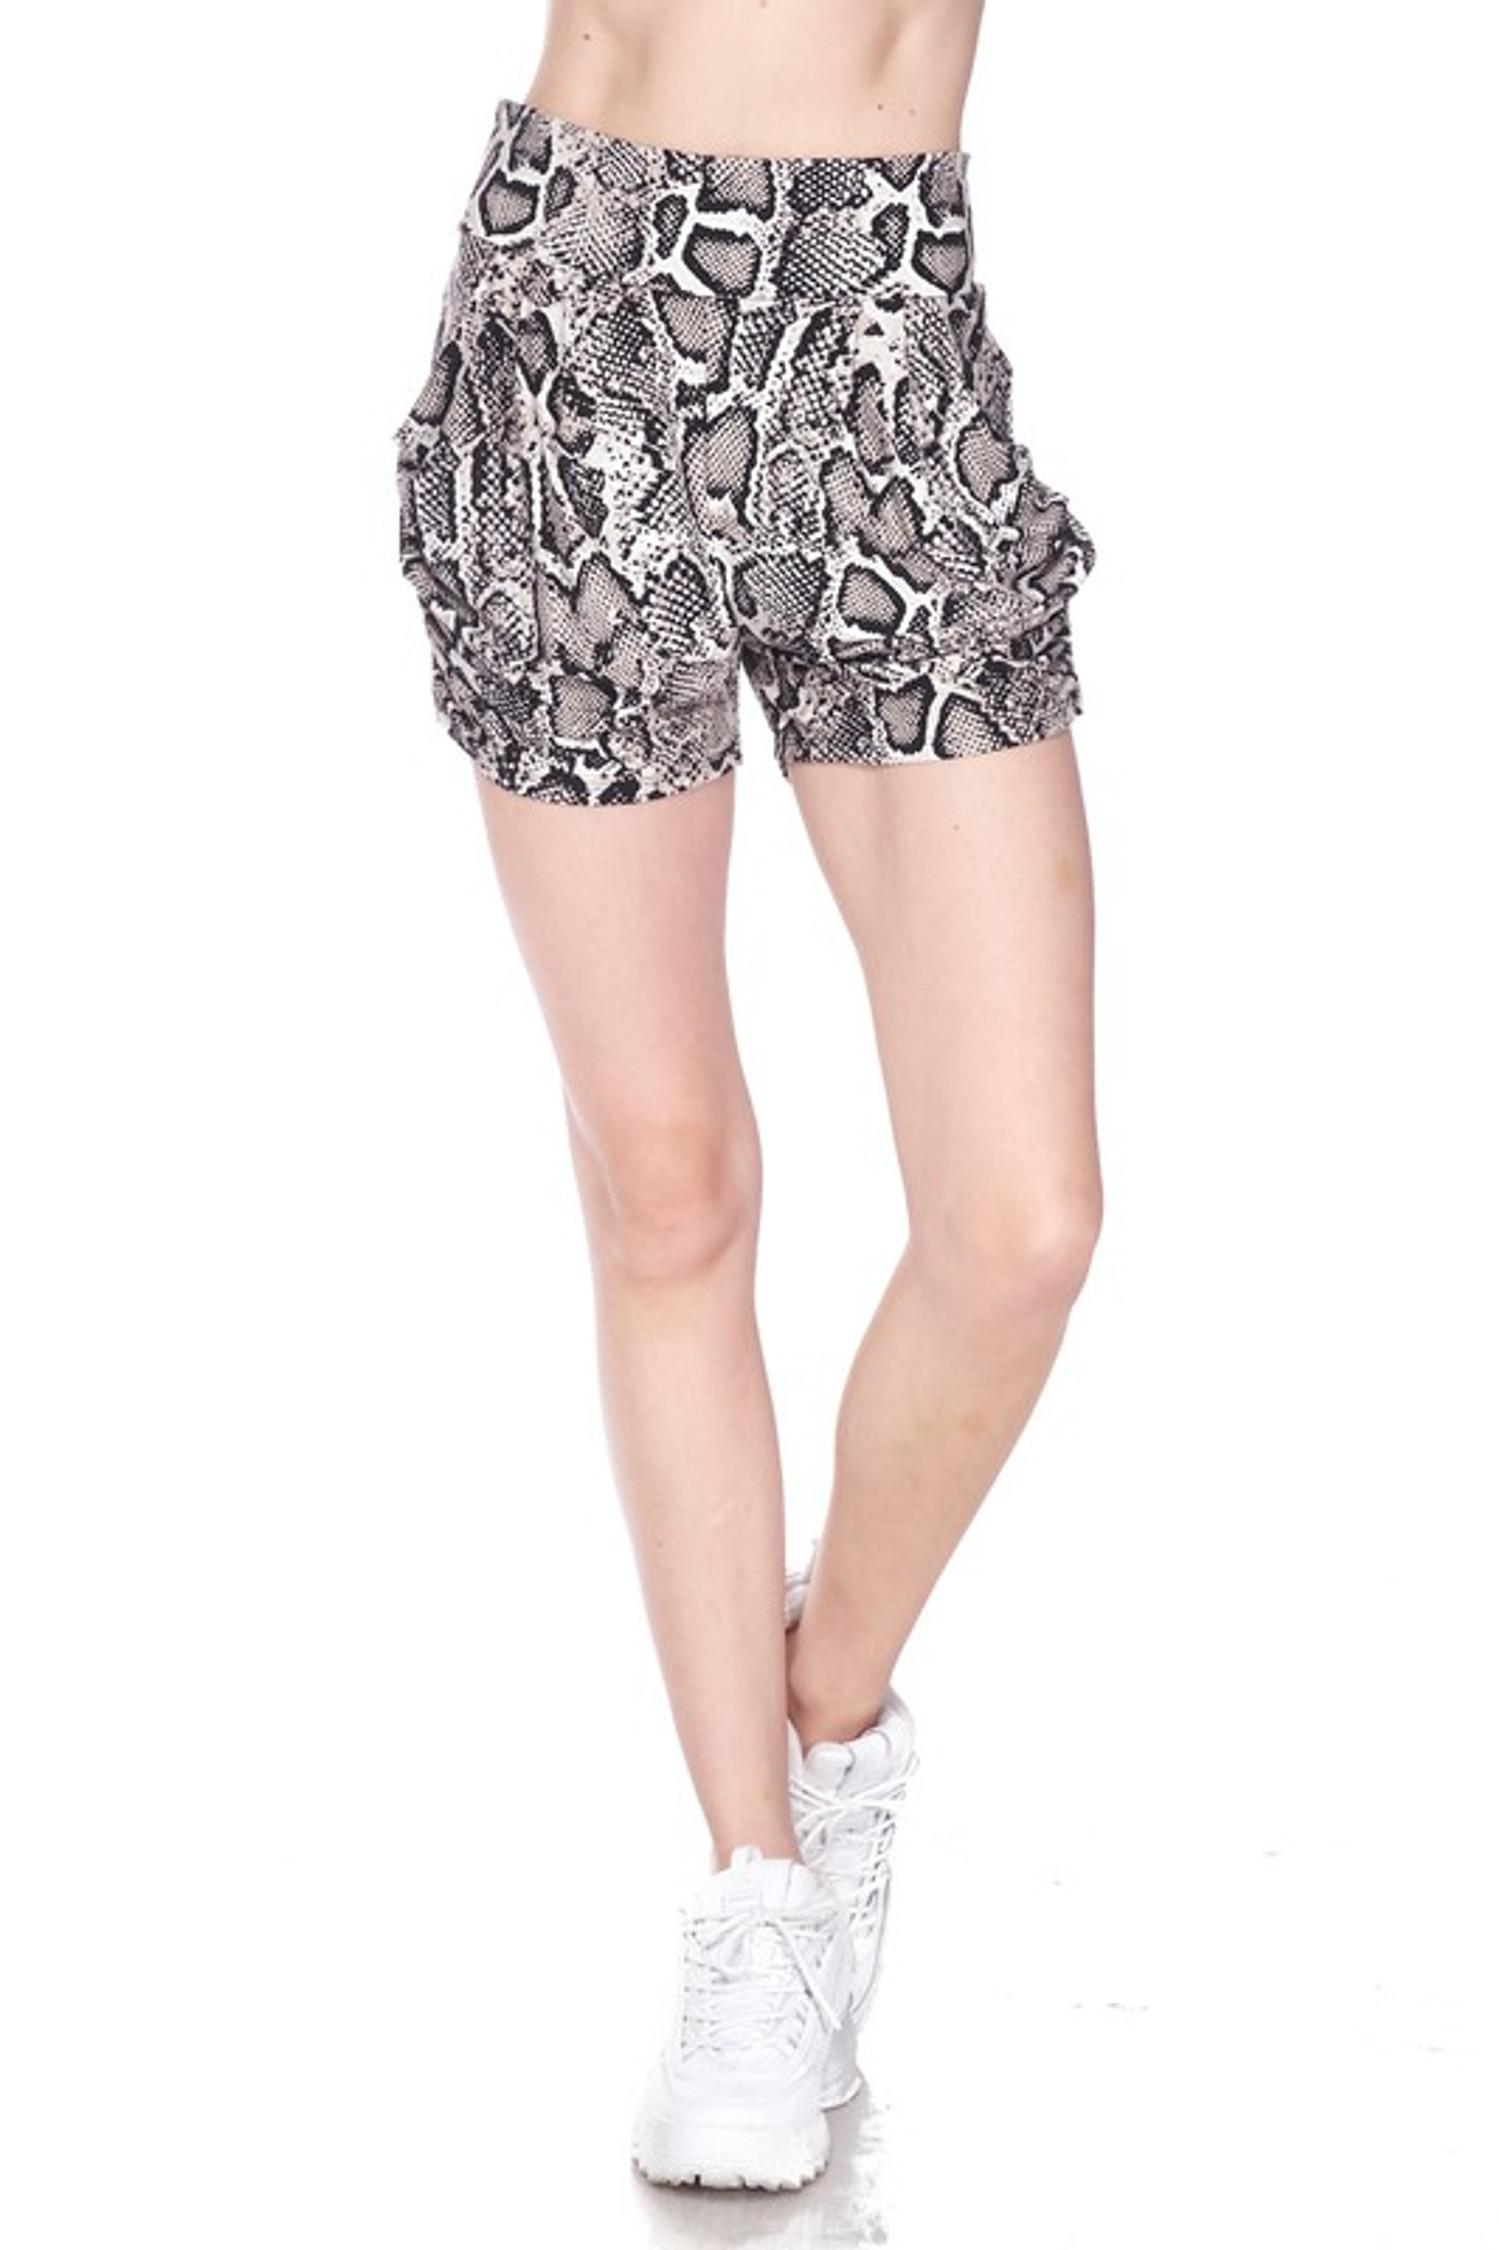 Buttery Soft Beige Boa Snakeskin Plus Size Harem Shorts